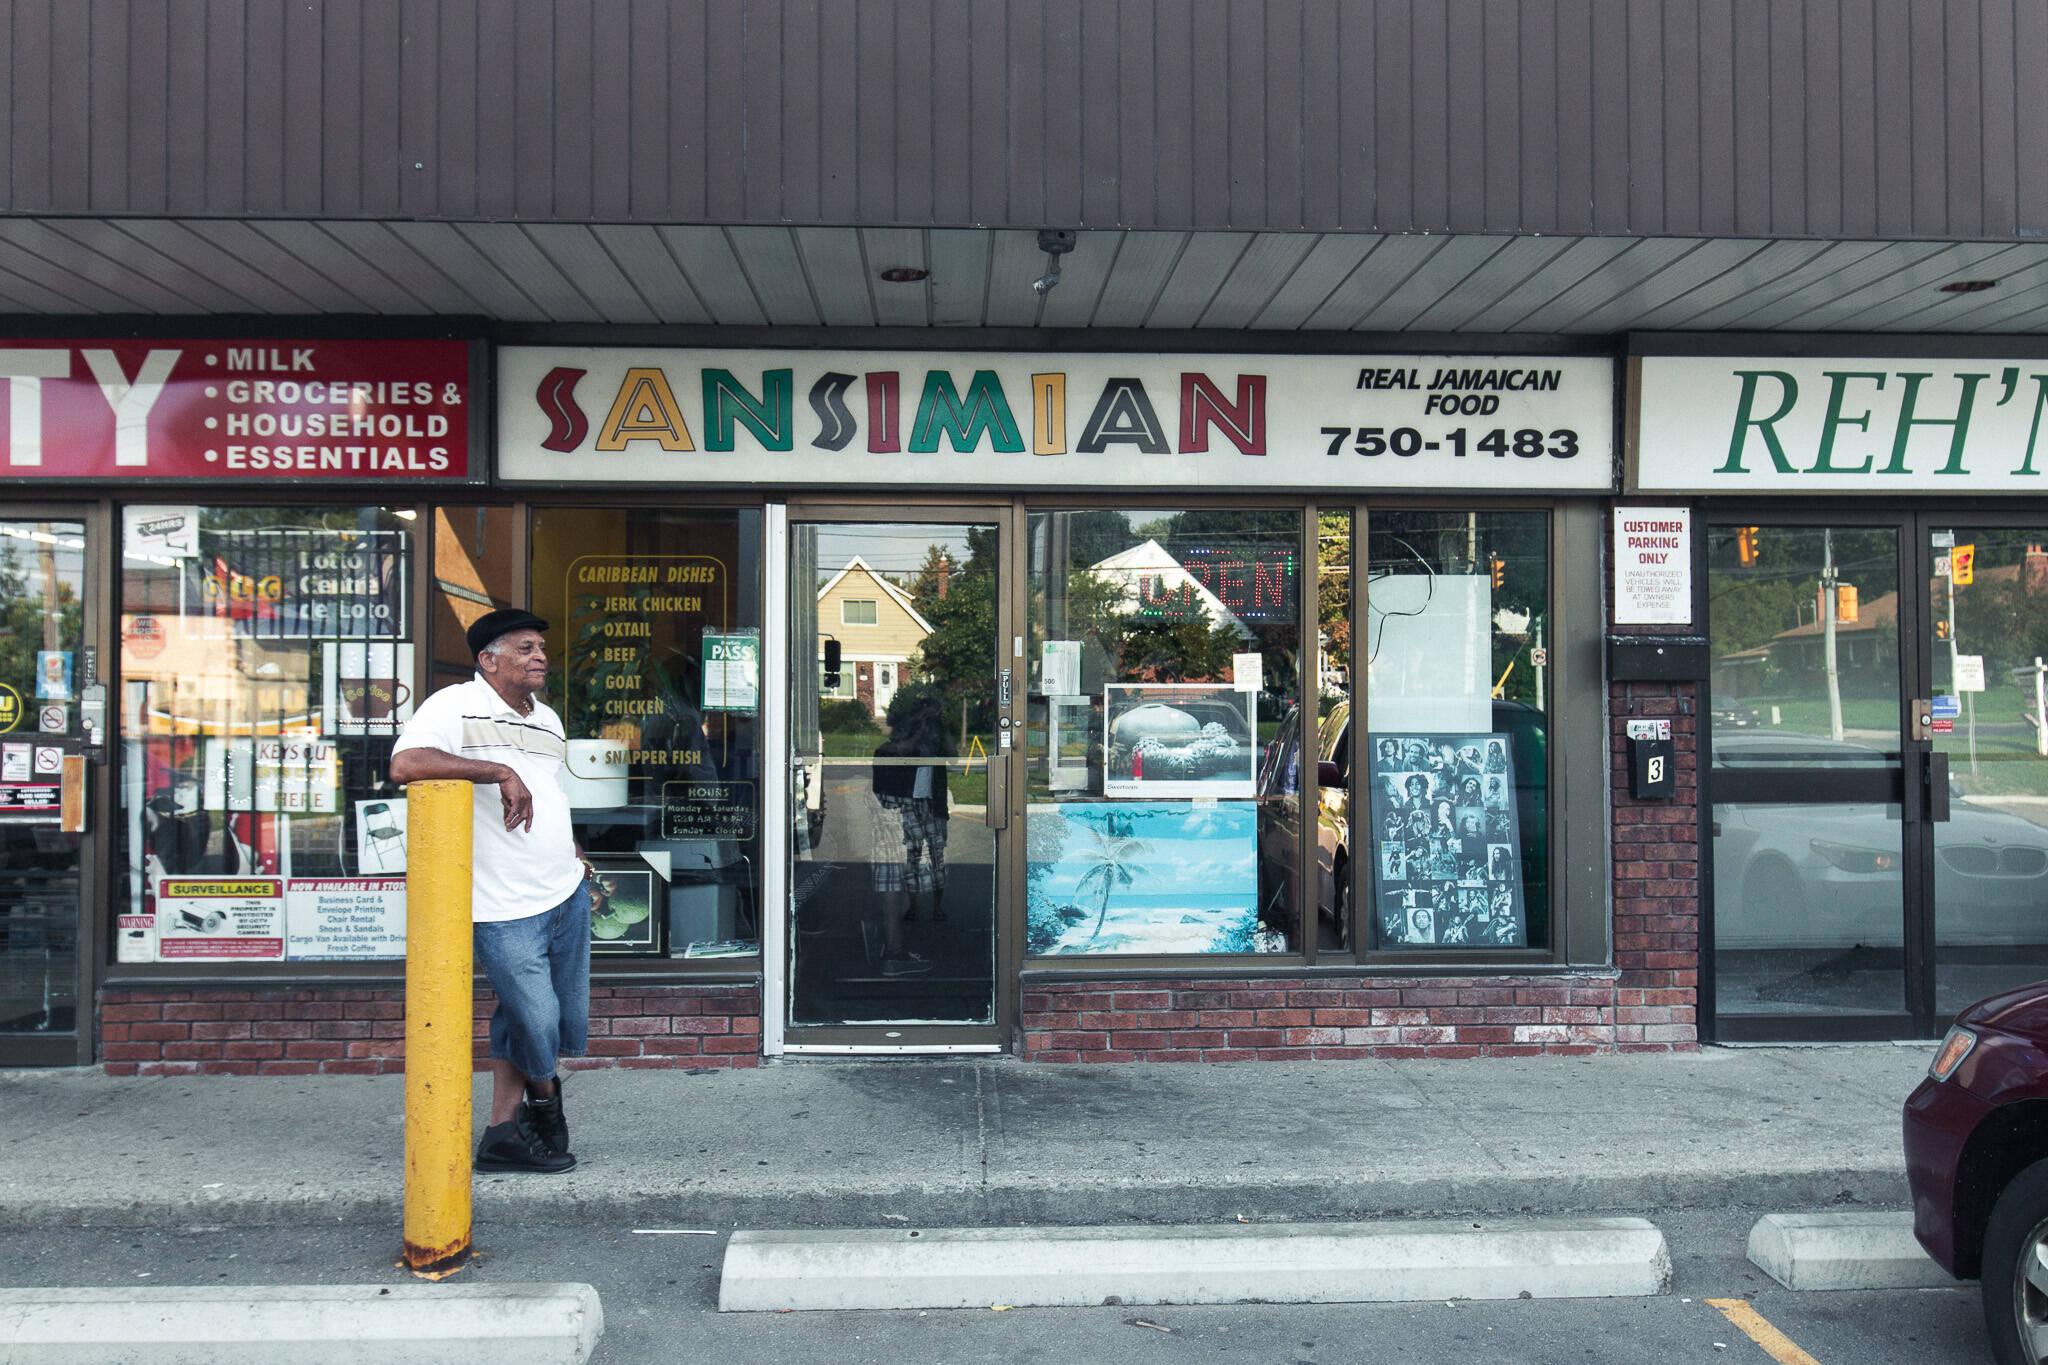 Sanismian Toronto